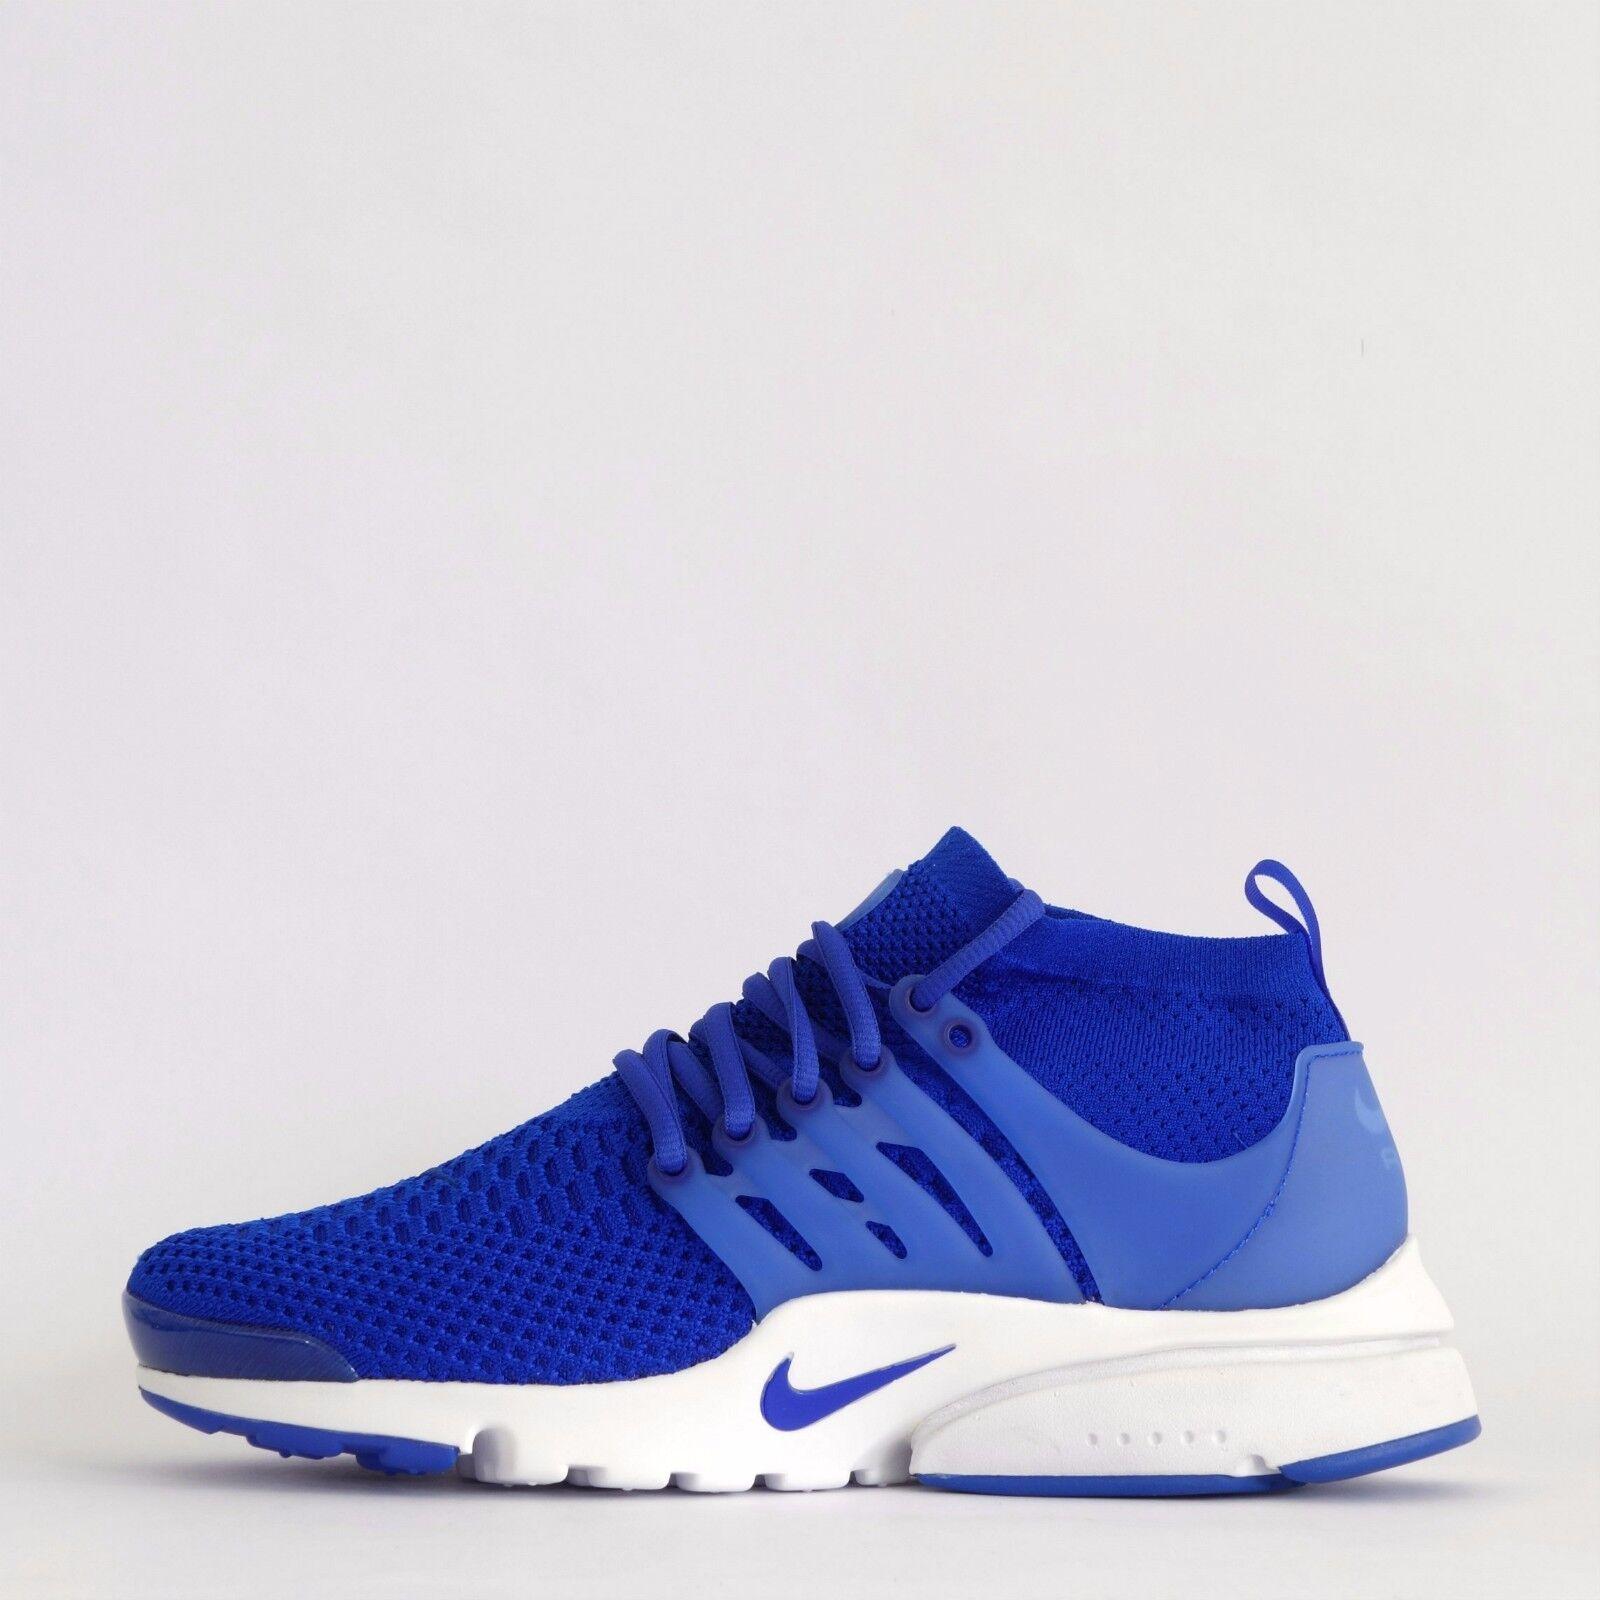 Nike Luft Presto Flyknit Ultra Herren Laufschuhe Turnschuhe Blau